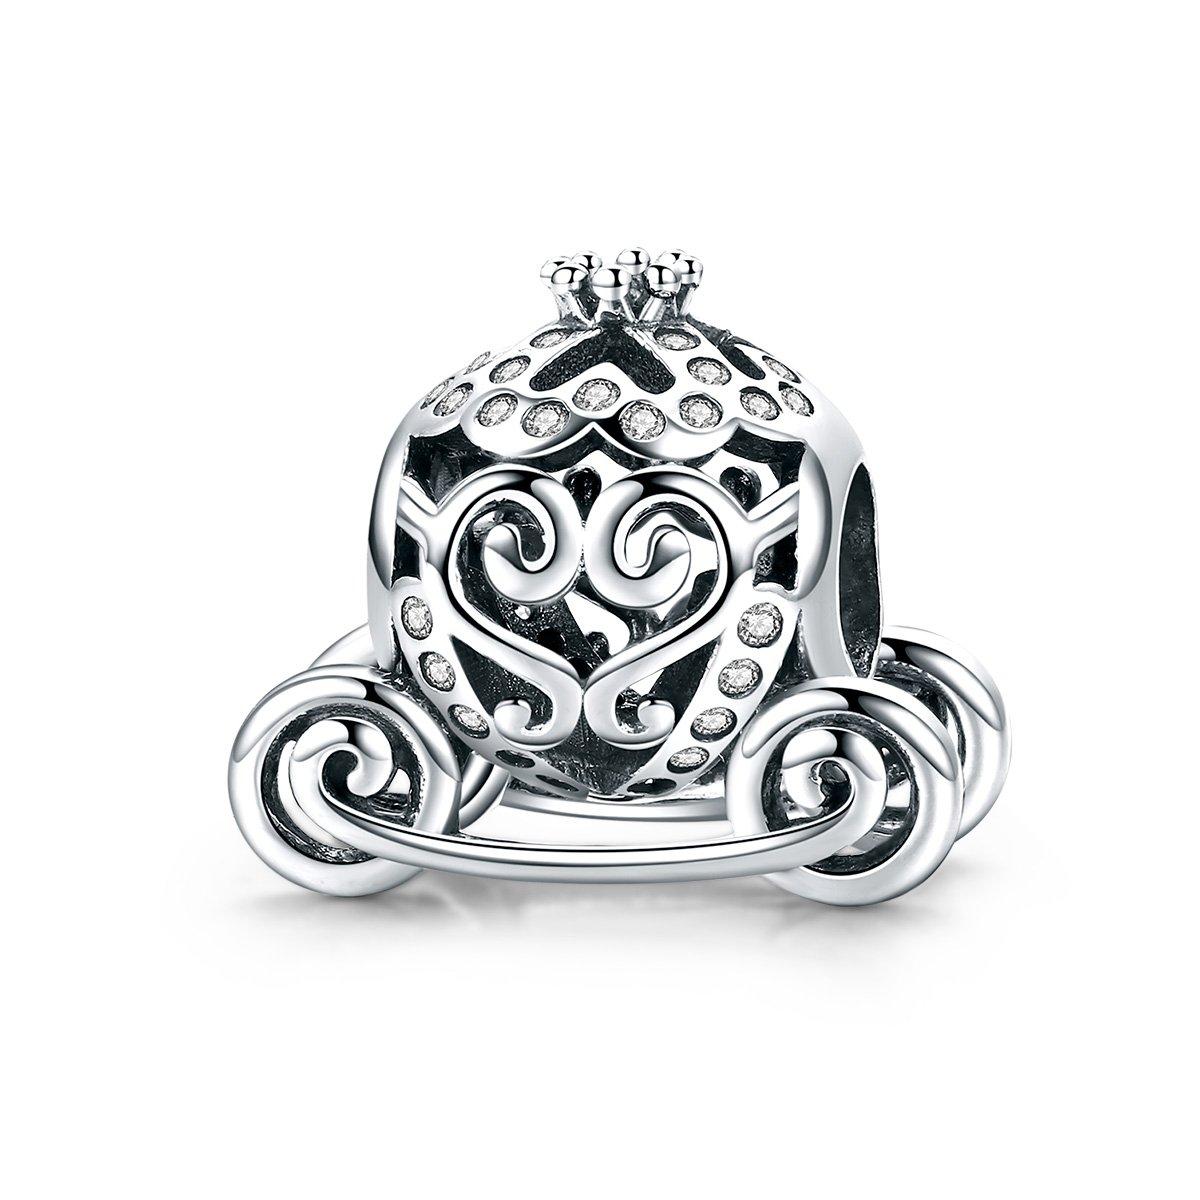 WOSTU Silver Charms 925 Sterling Silver Royal Princess Pumpkin Carriage Charms for Charm Bracelets